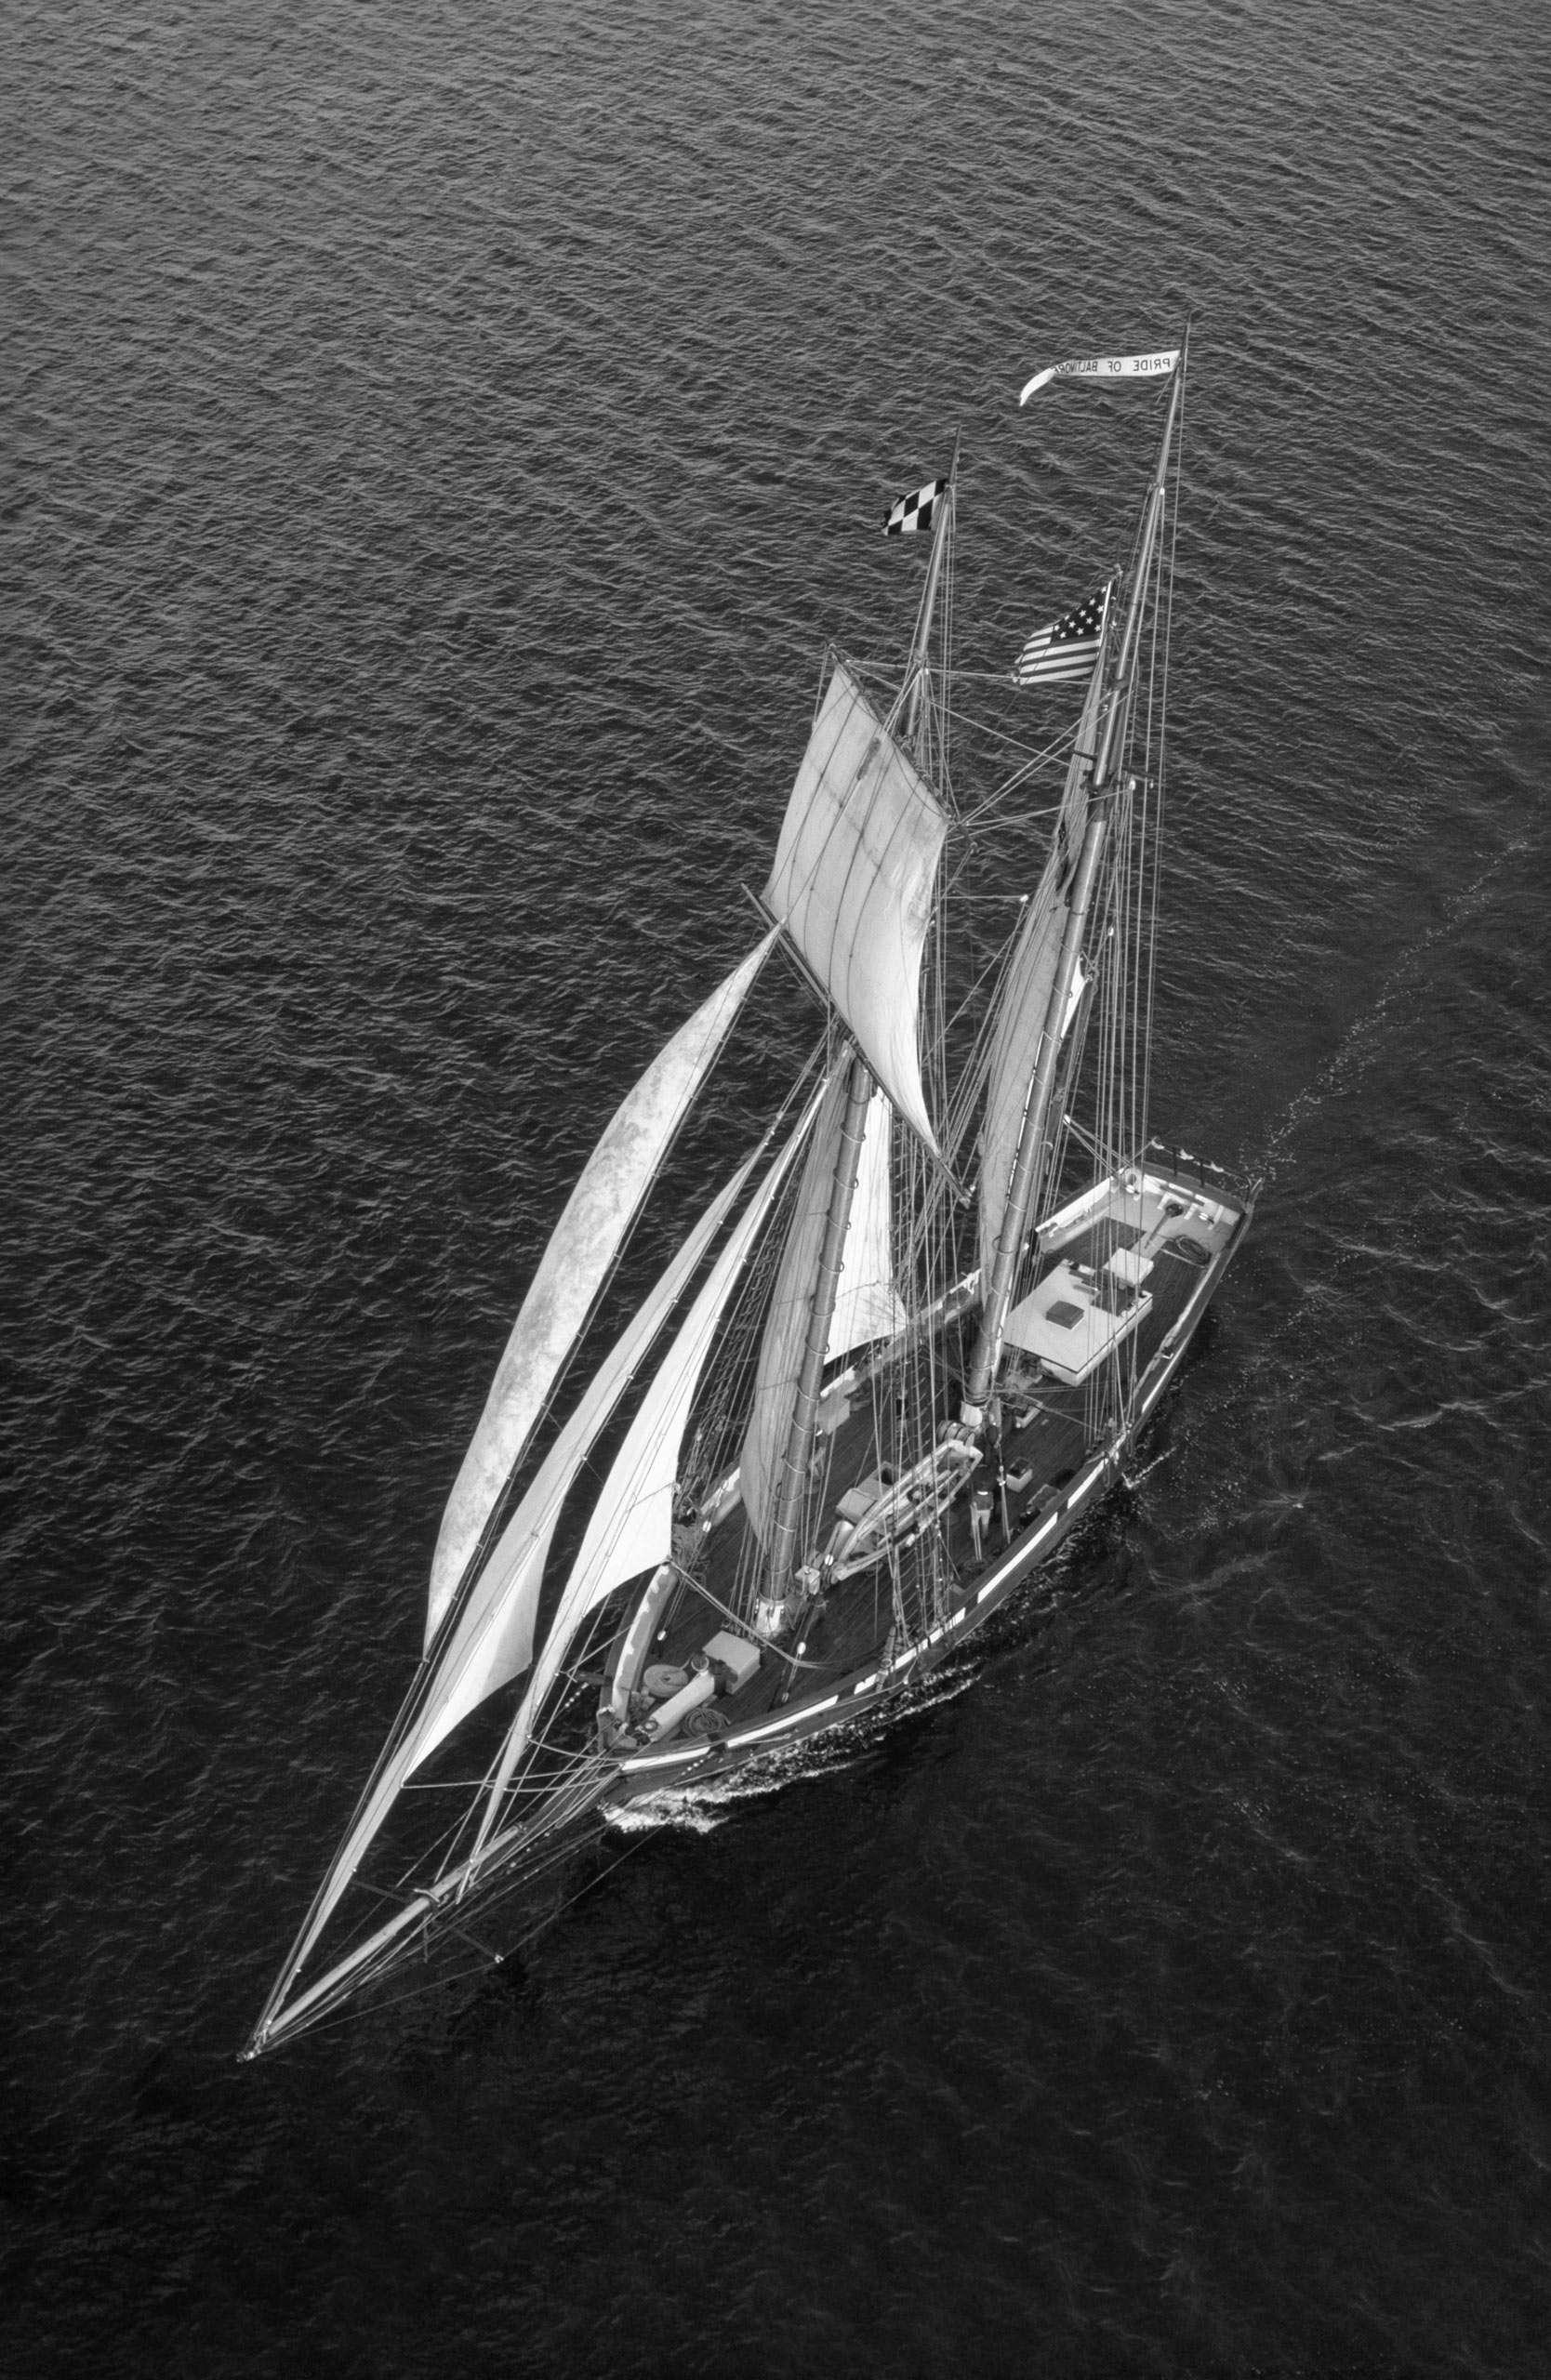 PORTFOLIO - Maritime #9 - B&W - PCG349